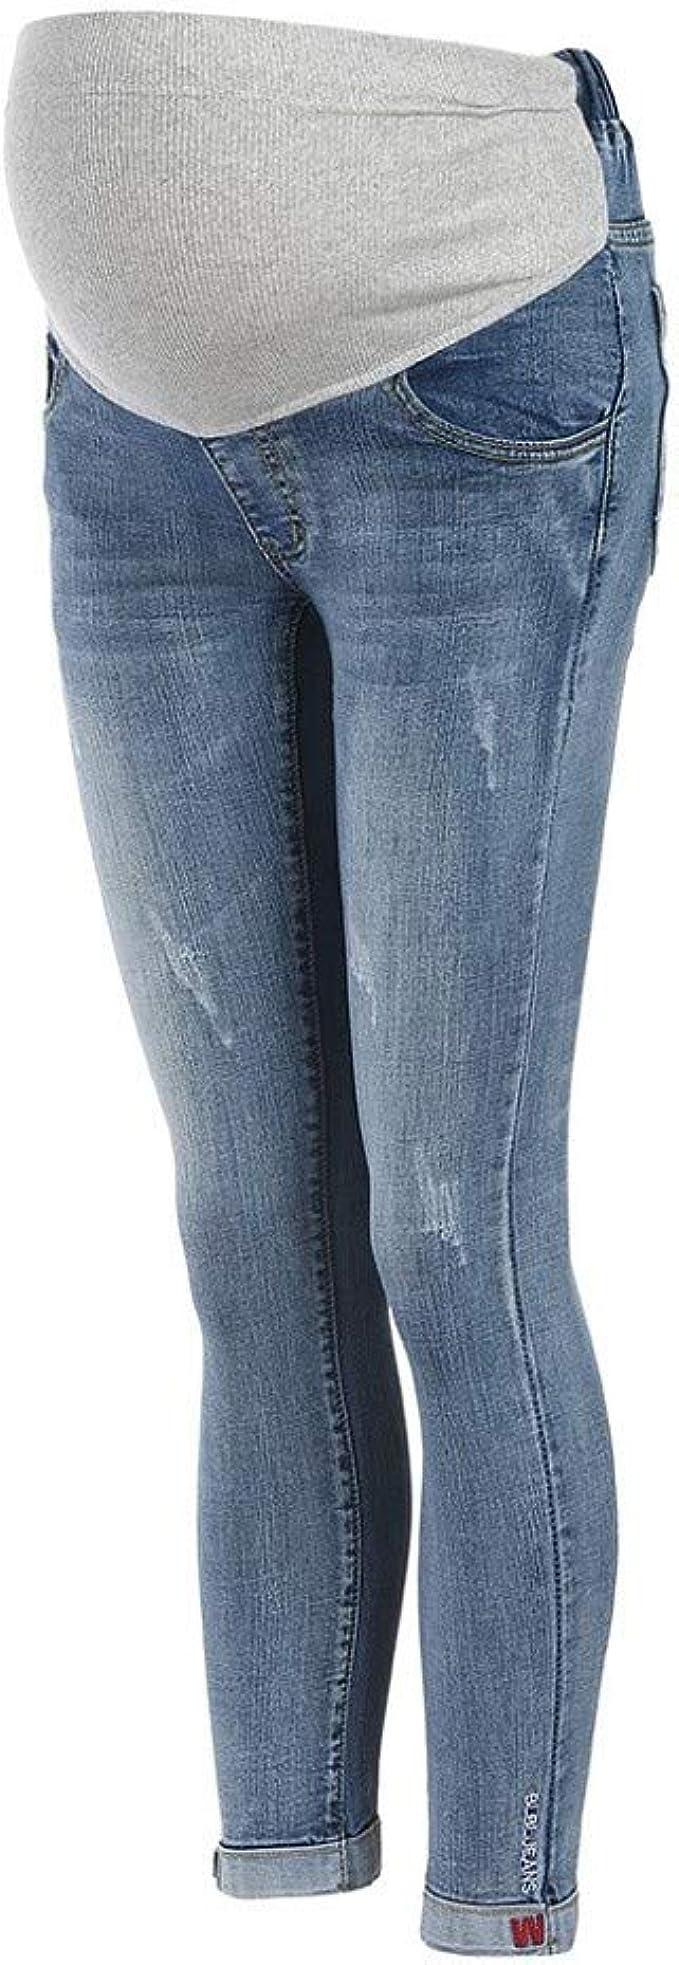 Damen Umstandsjeans Umstandshose Schwangerschafts Hose Jeans mit Bauchband D43